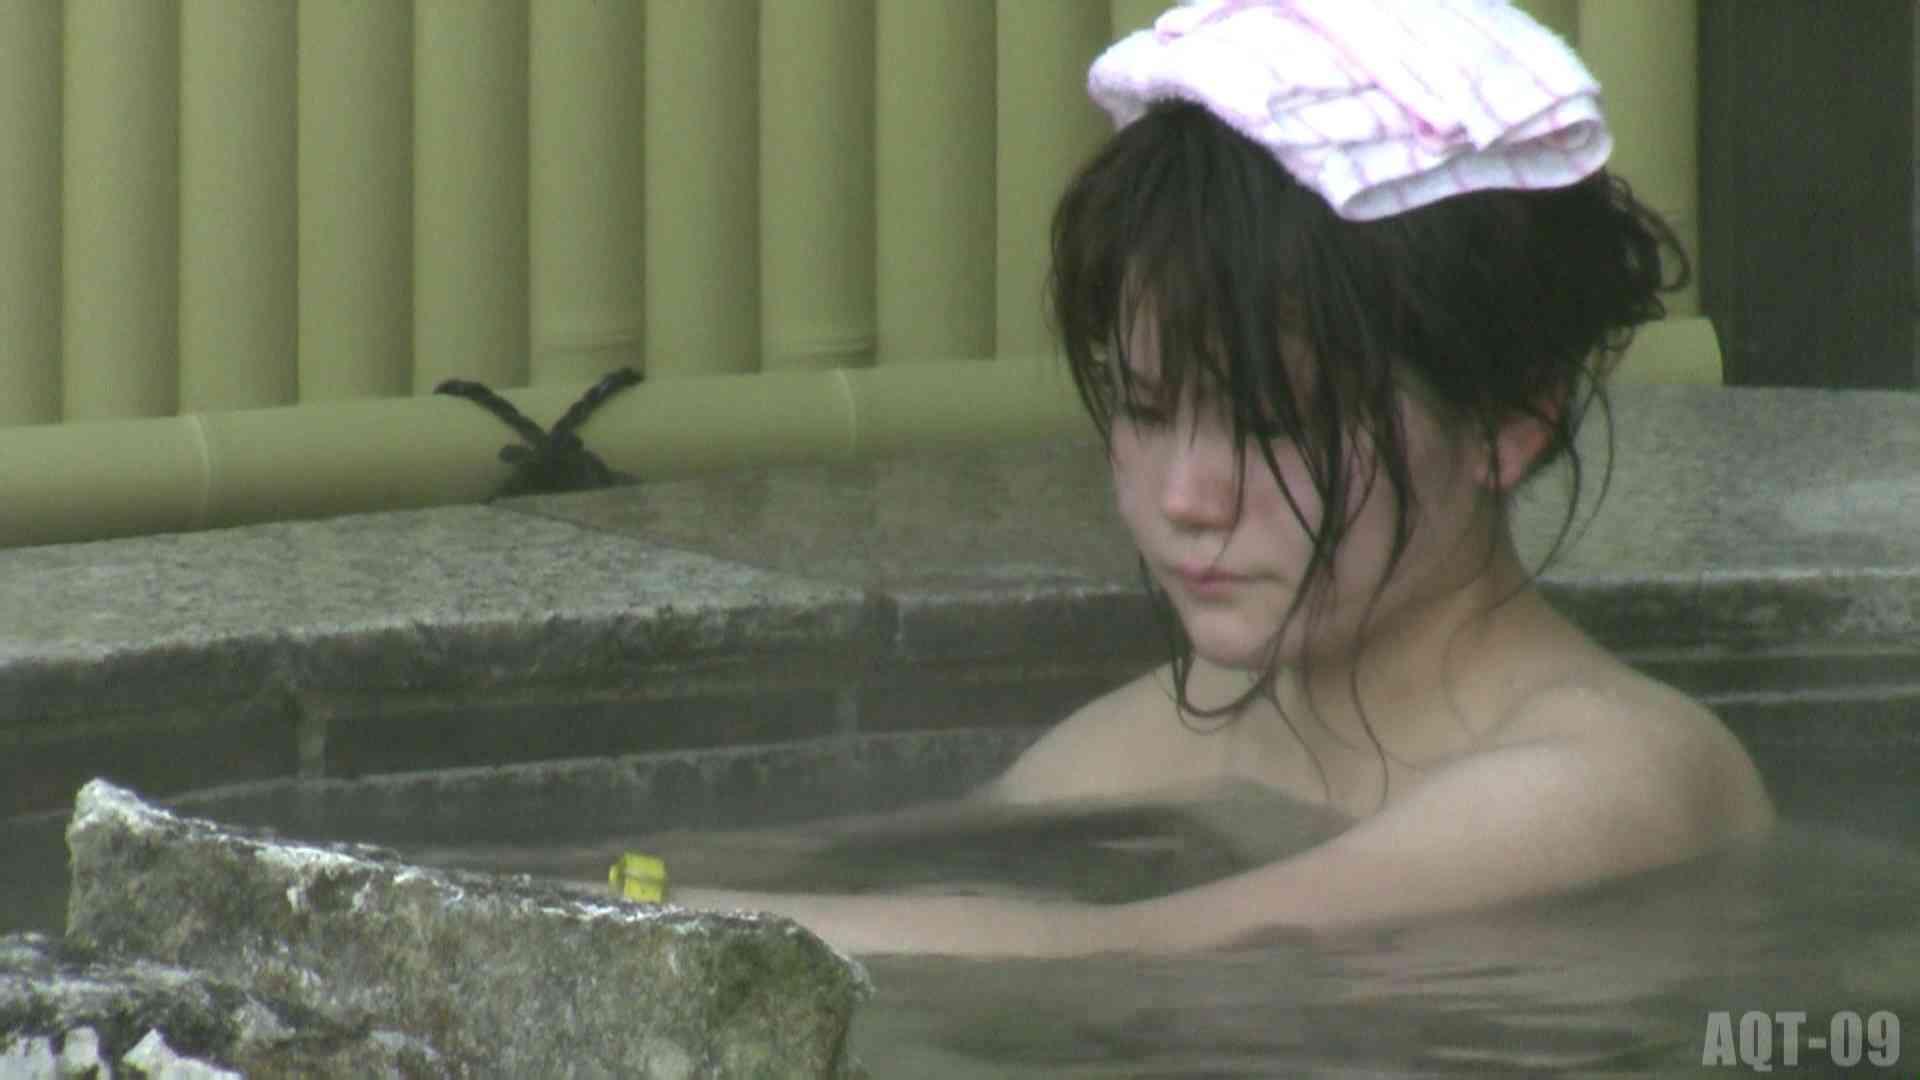 Aquaな露天風呂Vol.789 盗撮映像  51Pix 4